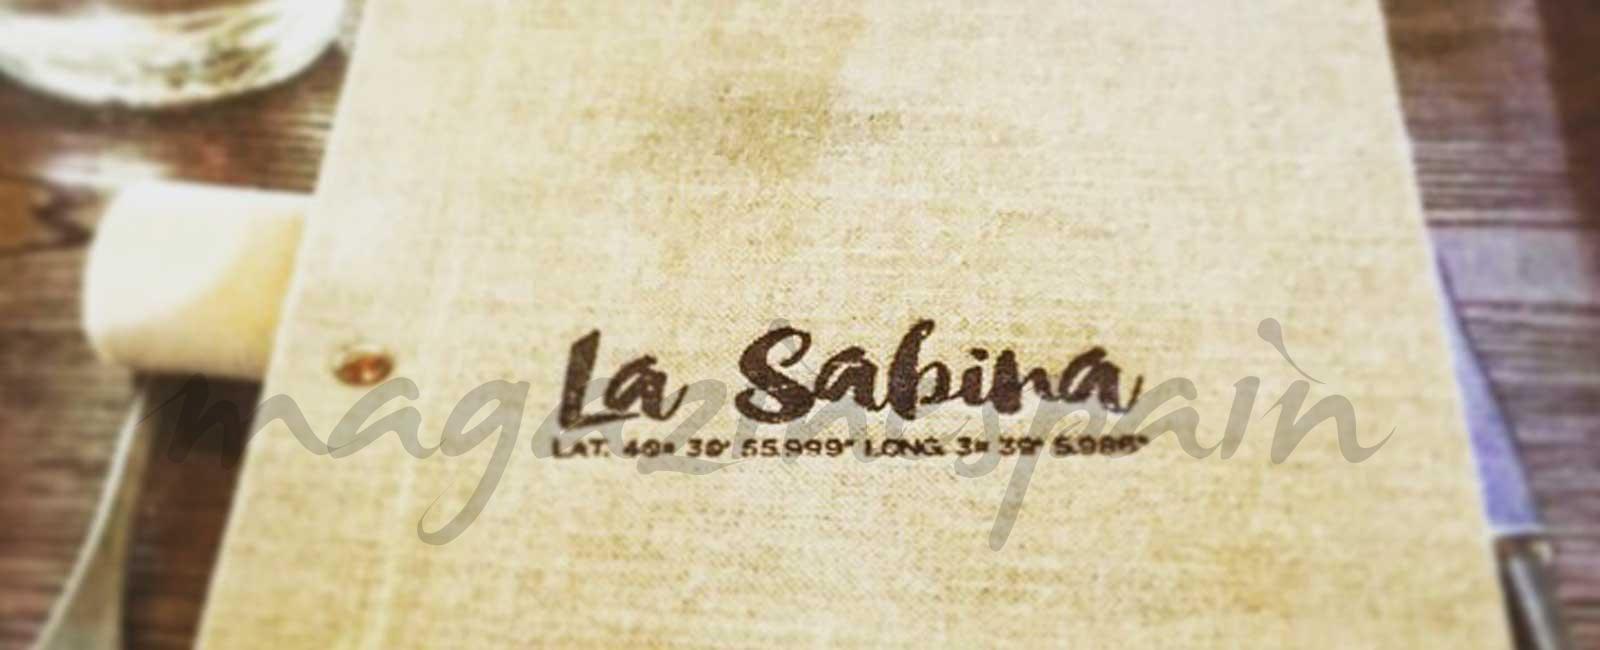 La Sabina: Larrumba nos transporta al Mediterráneo